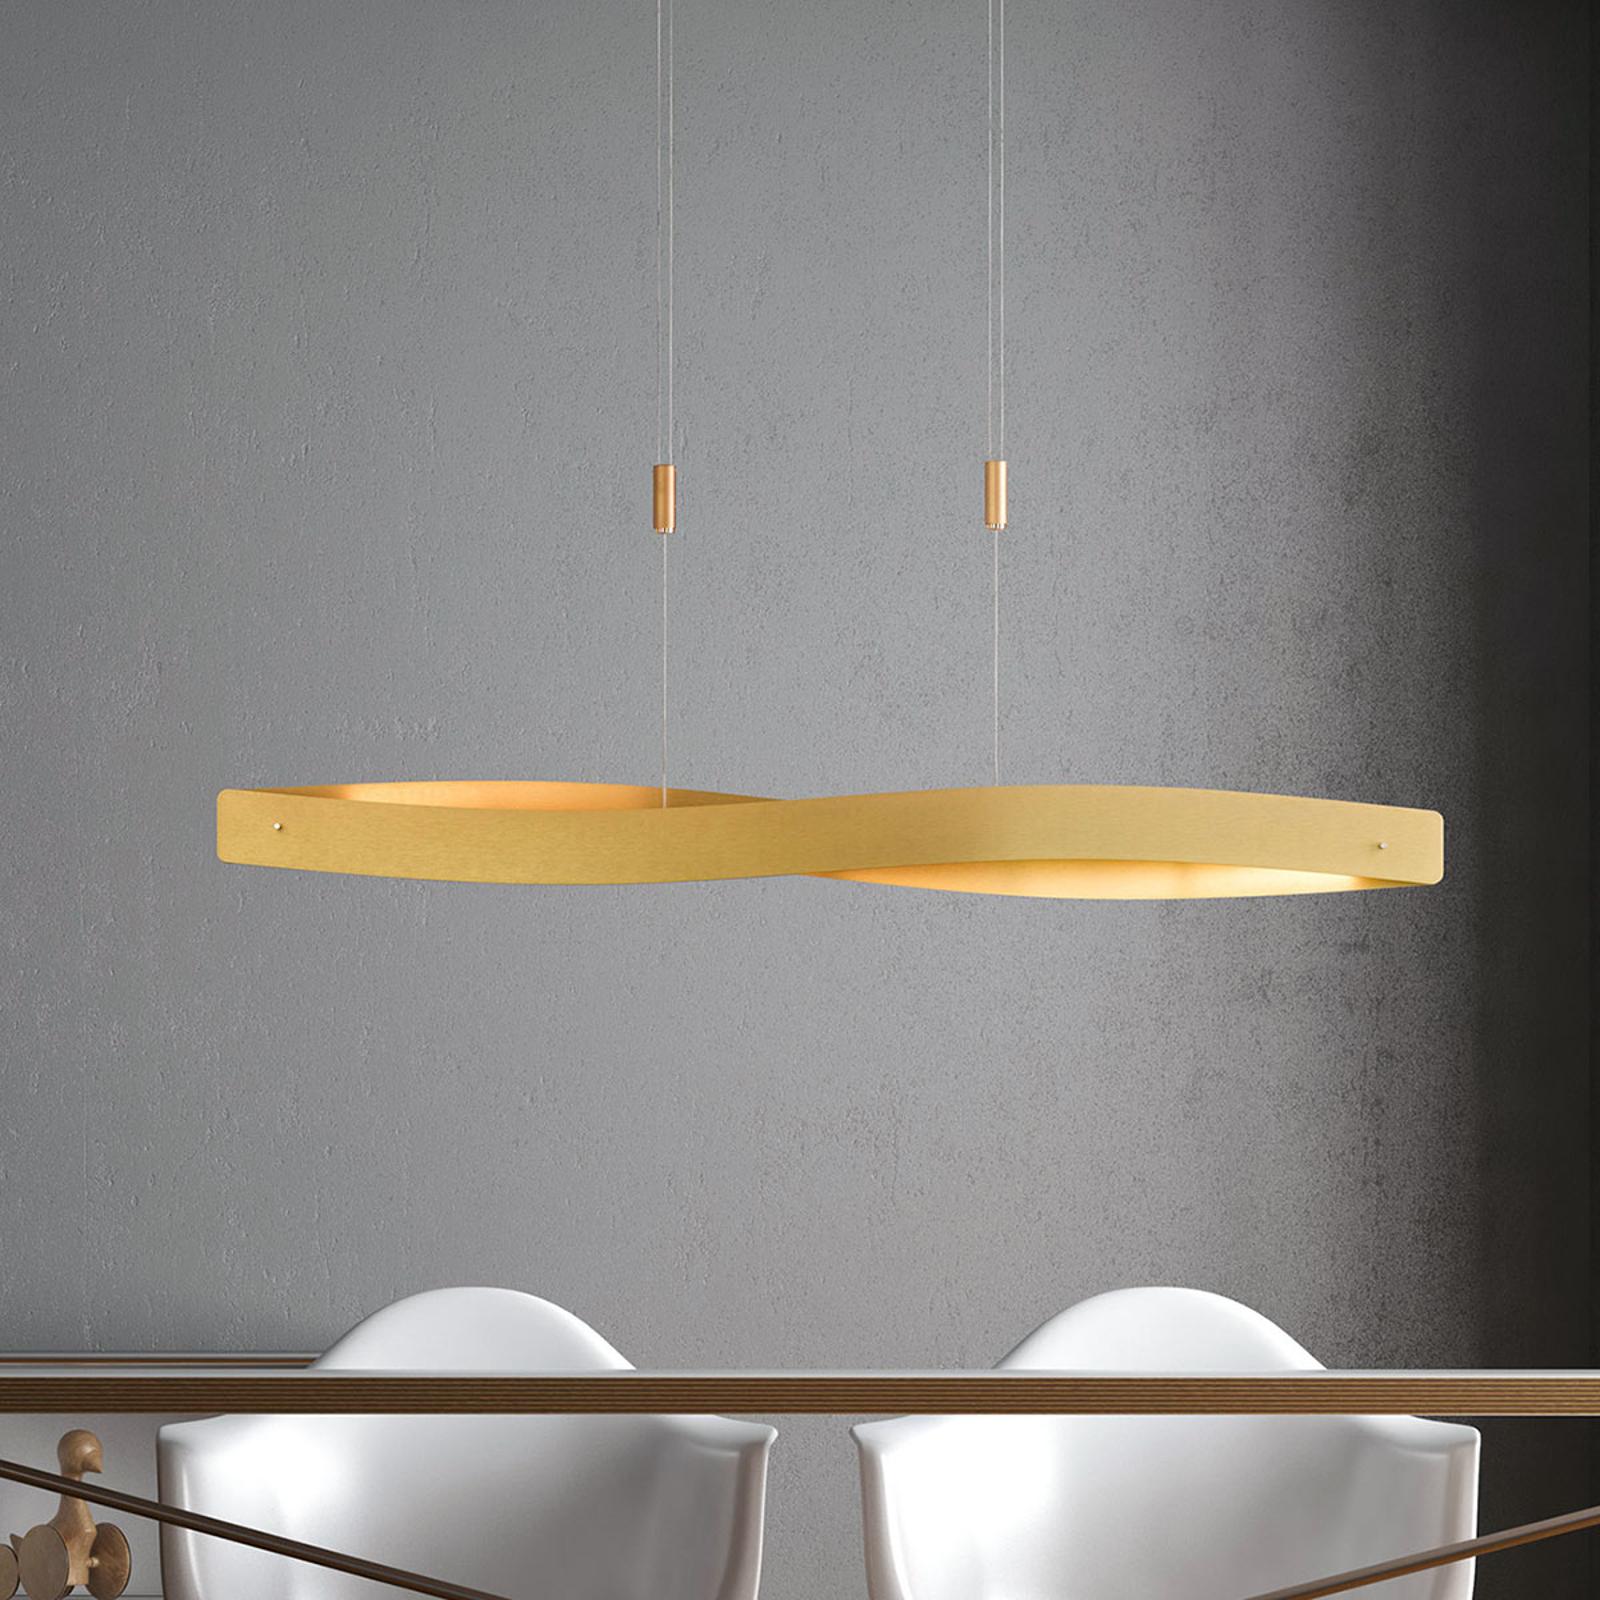 Acquista Lucande Lian sospensione LED ottone, regolabile